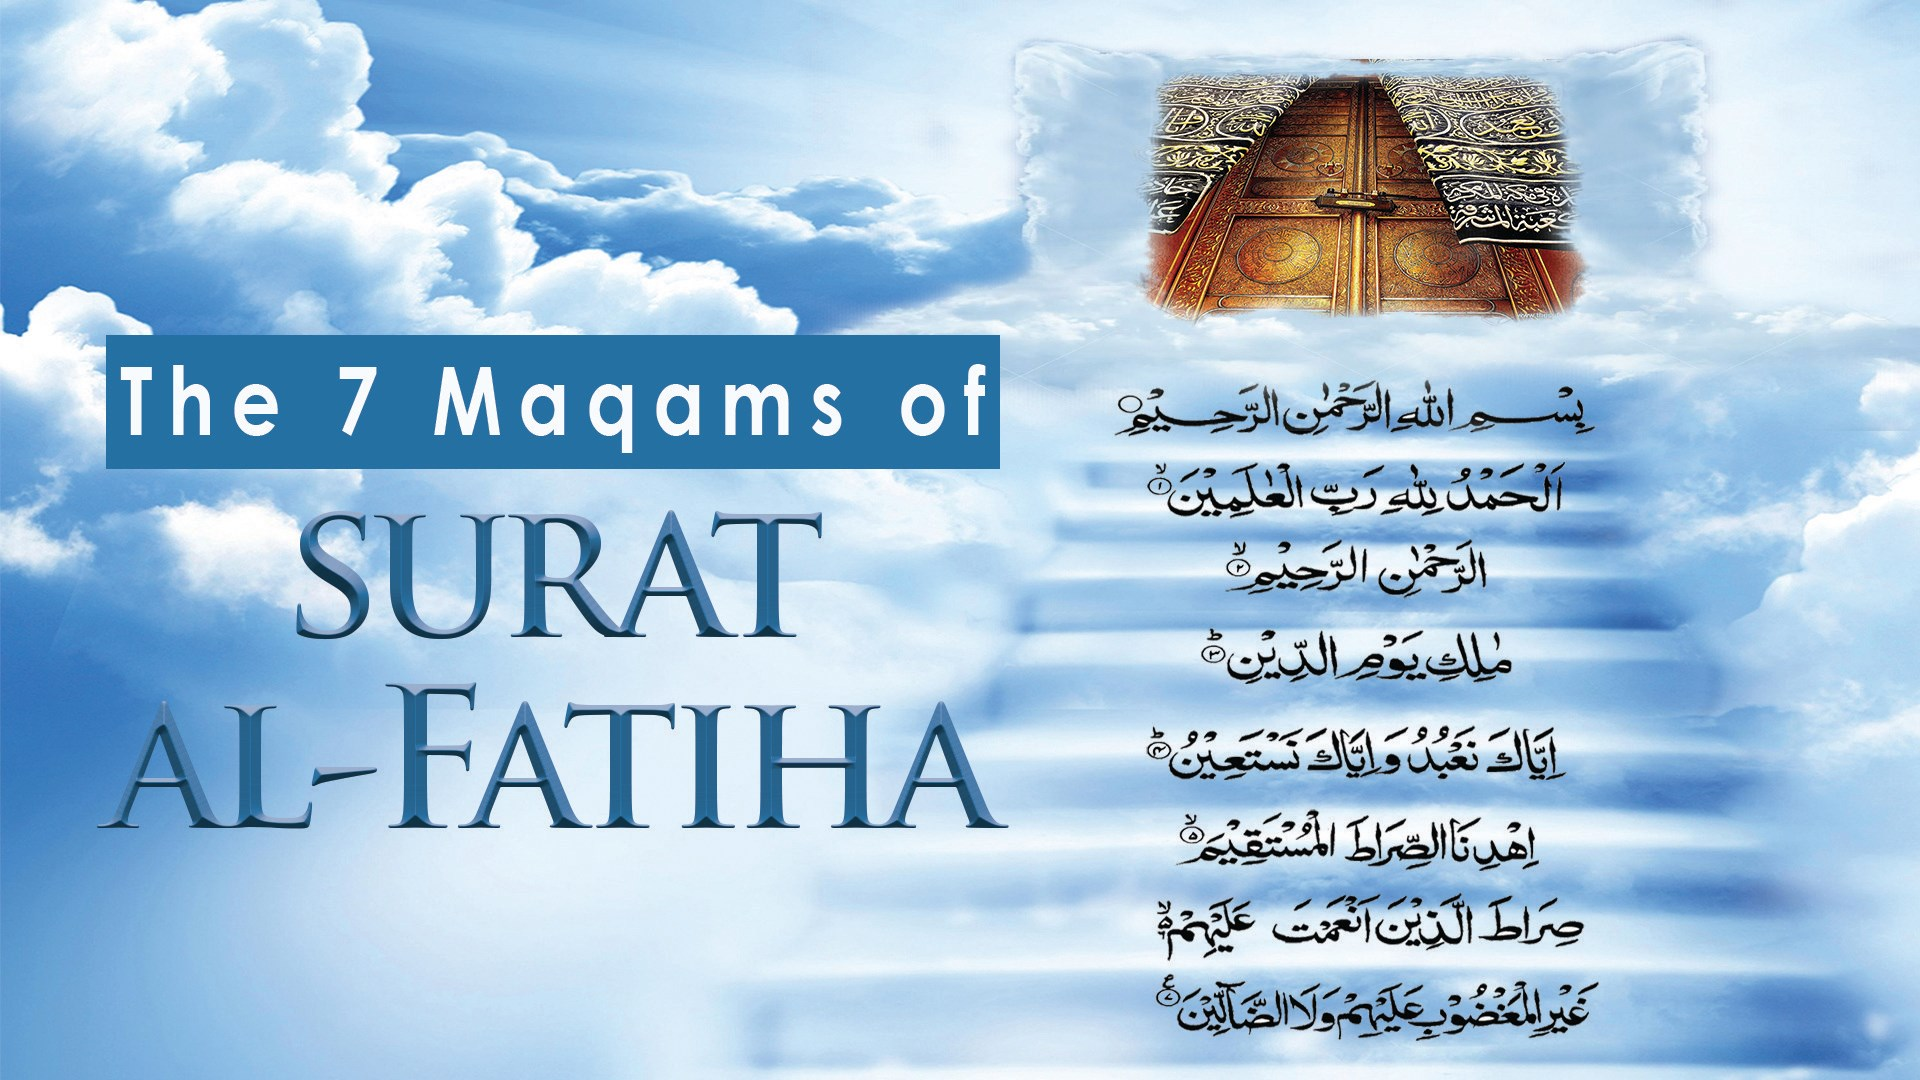 7 Maqams of Surah Fatiha A Believer Must Traverse – Part 1 سورہ فاتحہ کے 7 مقام...